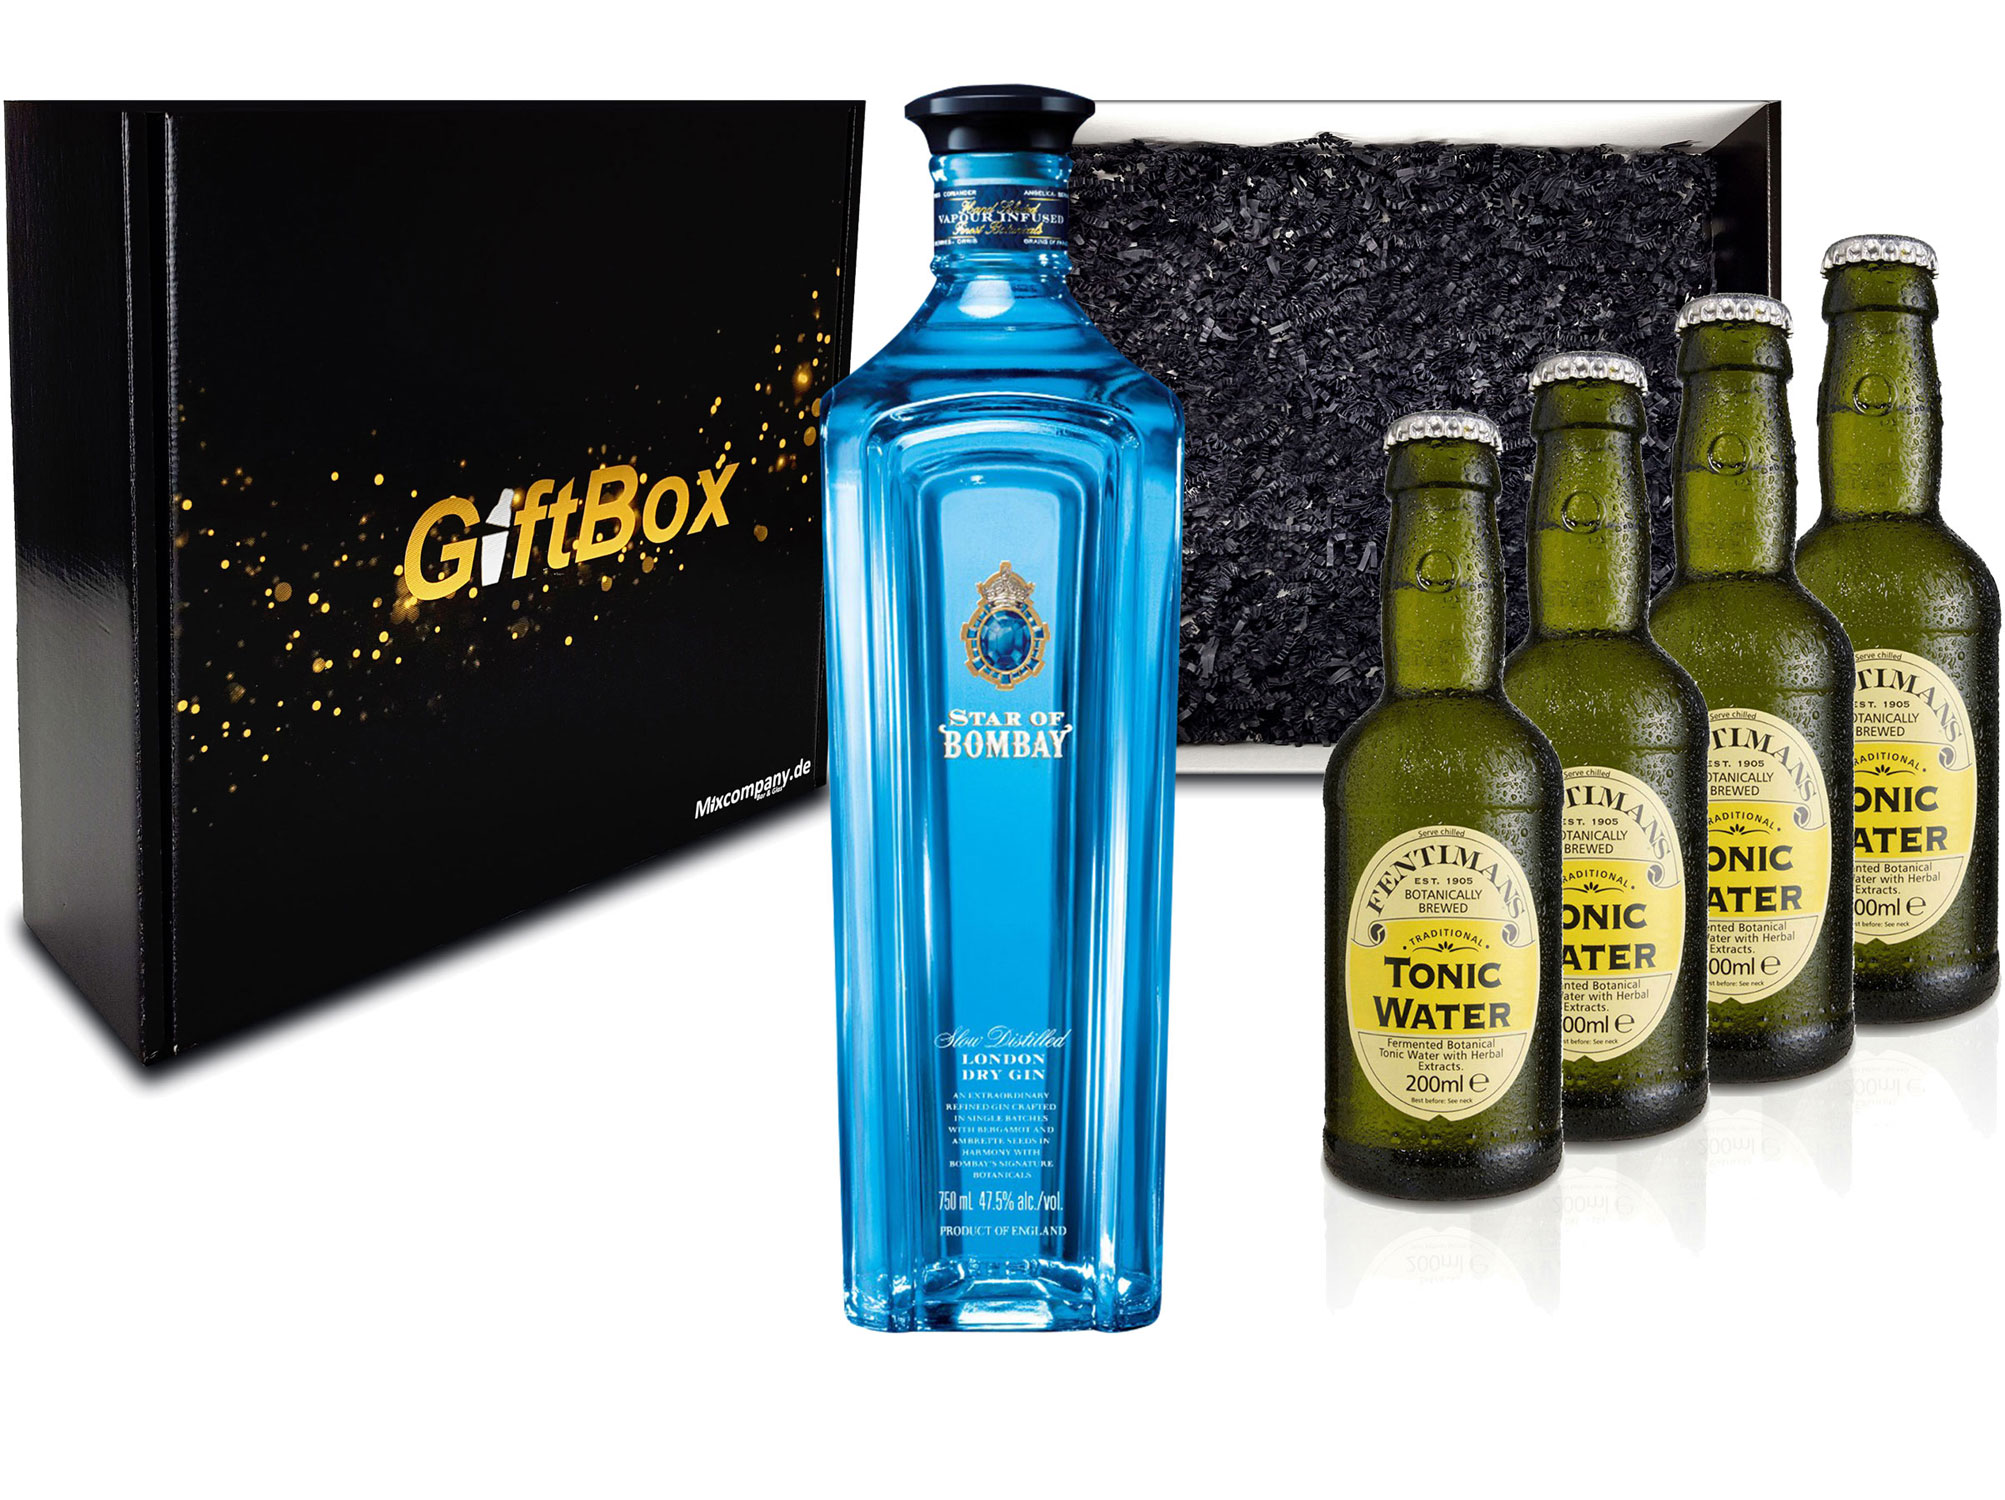 Gin Tonic Giftbox Geschenkset - Star of Bombay Slow Distilled London Dry Gin 0,7l (47,5% Vol) + 4x Fentimans Tonic Water 200ml inkl. Pfand MEHRWEG - [Enthält Sulfite]